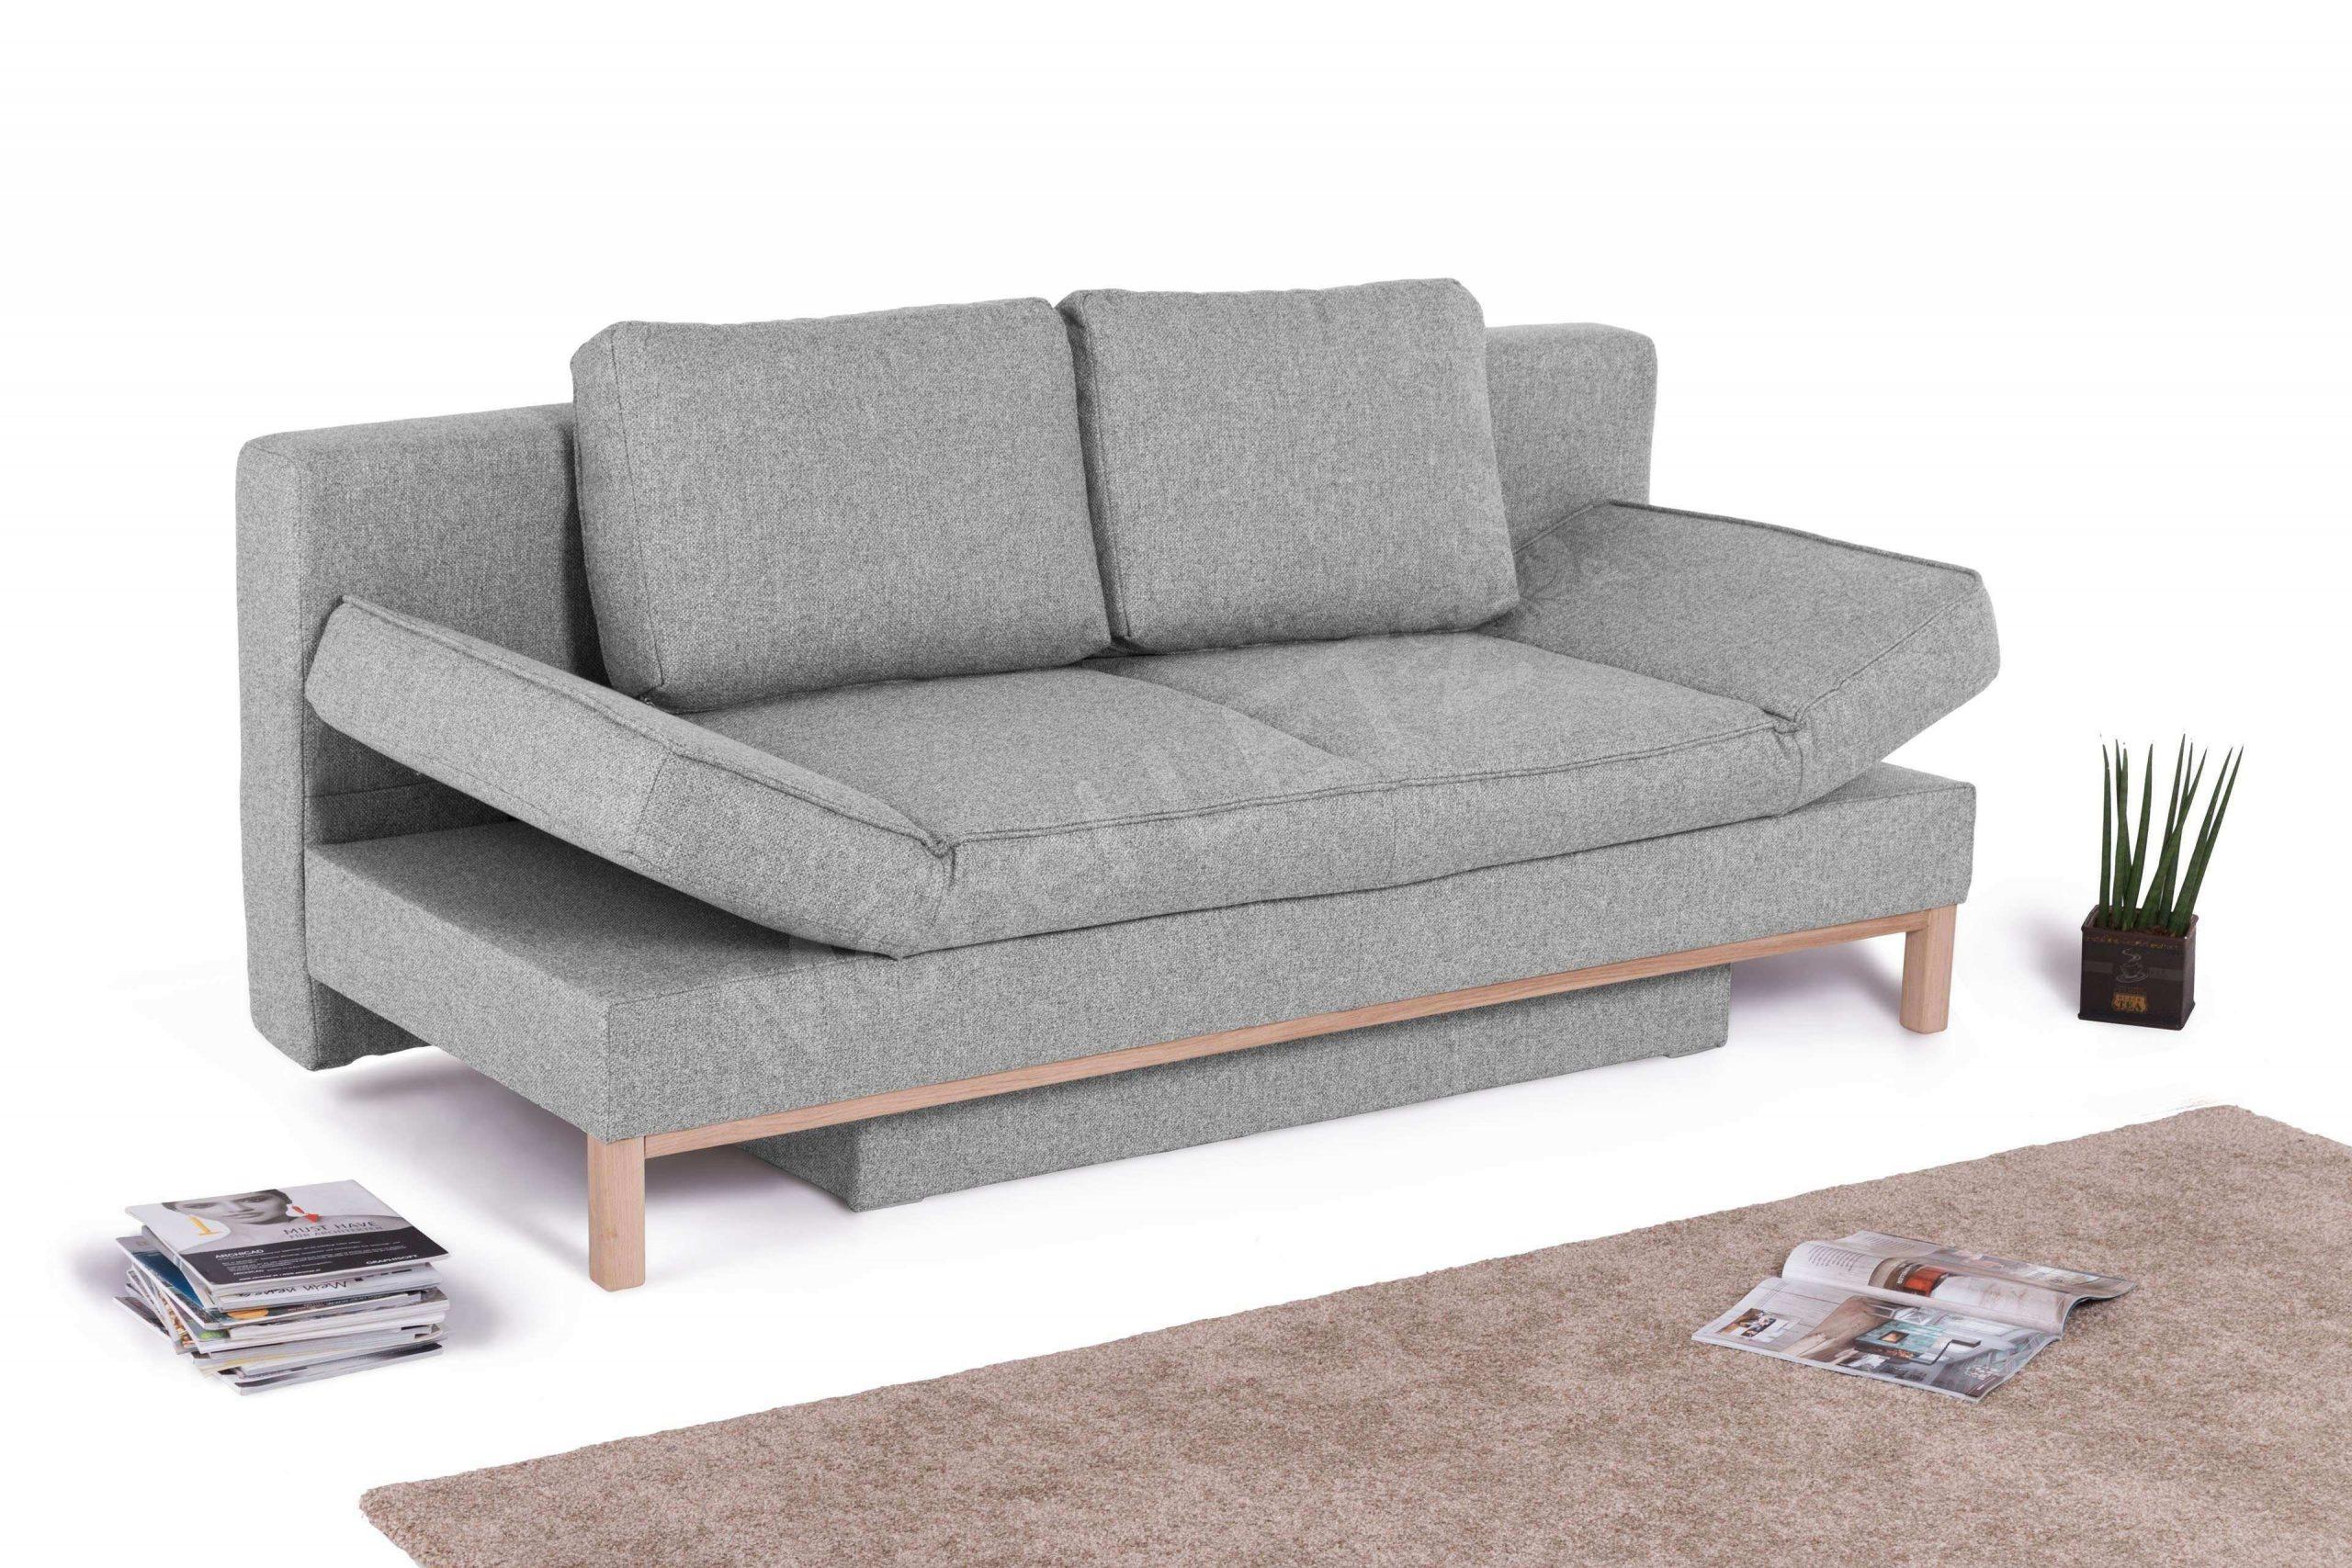 Canape Sofa Ikea Caseconrad Dedans Gralviken Ikea Video Agencecormierdelauniere Com Agencecormierdelauniere Com